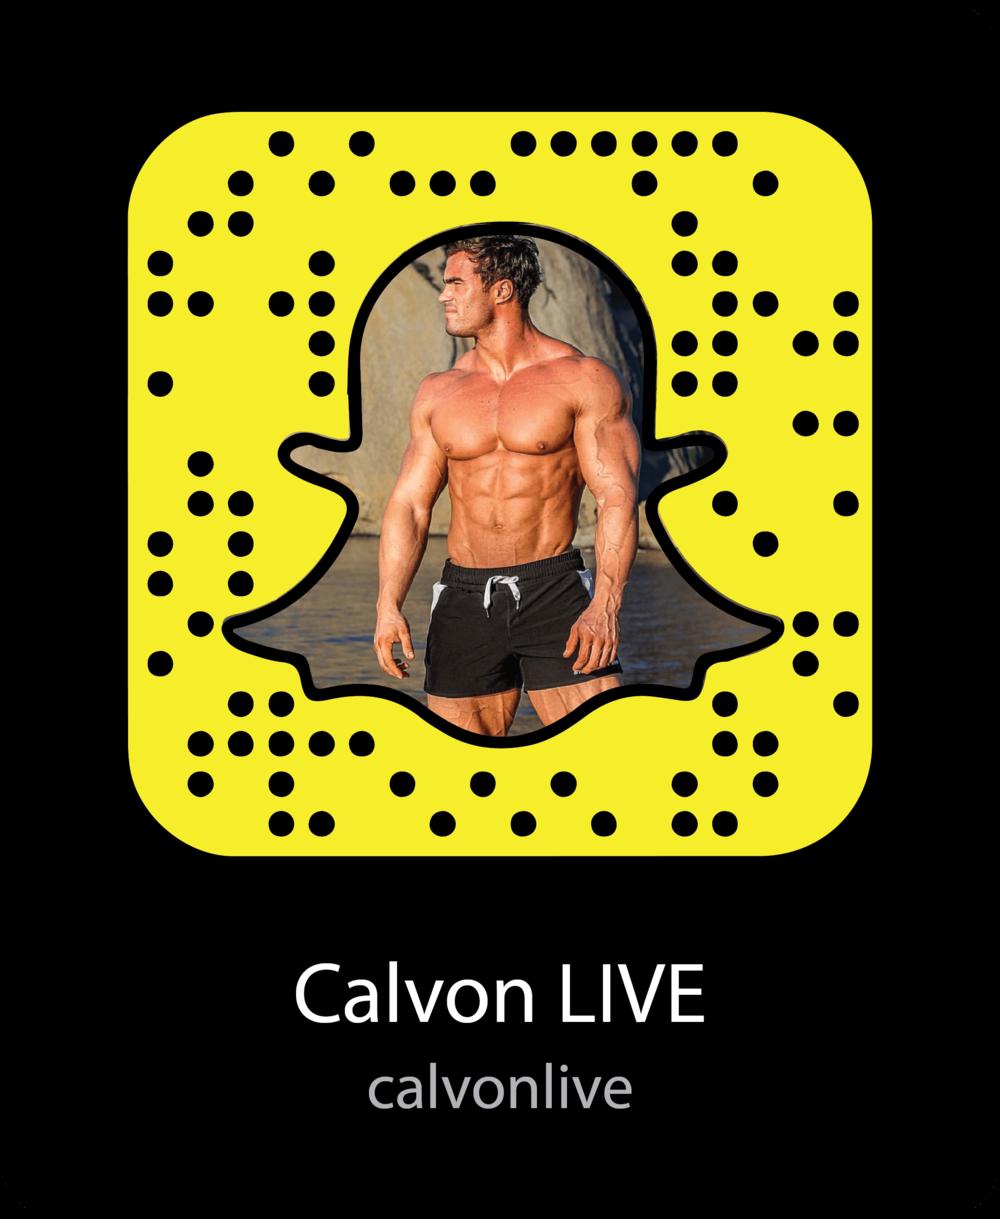 calvon-live-fitness-snapchat-snapcode